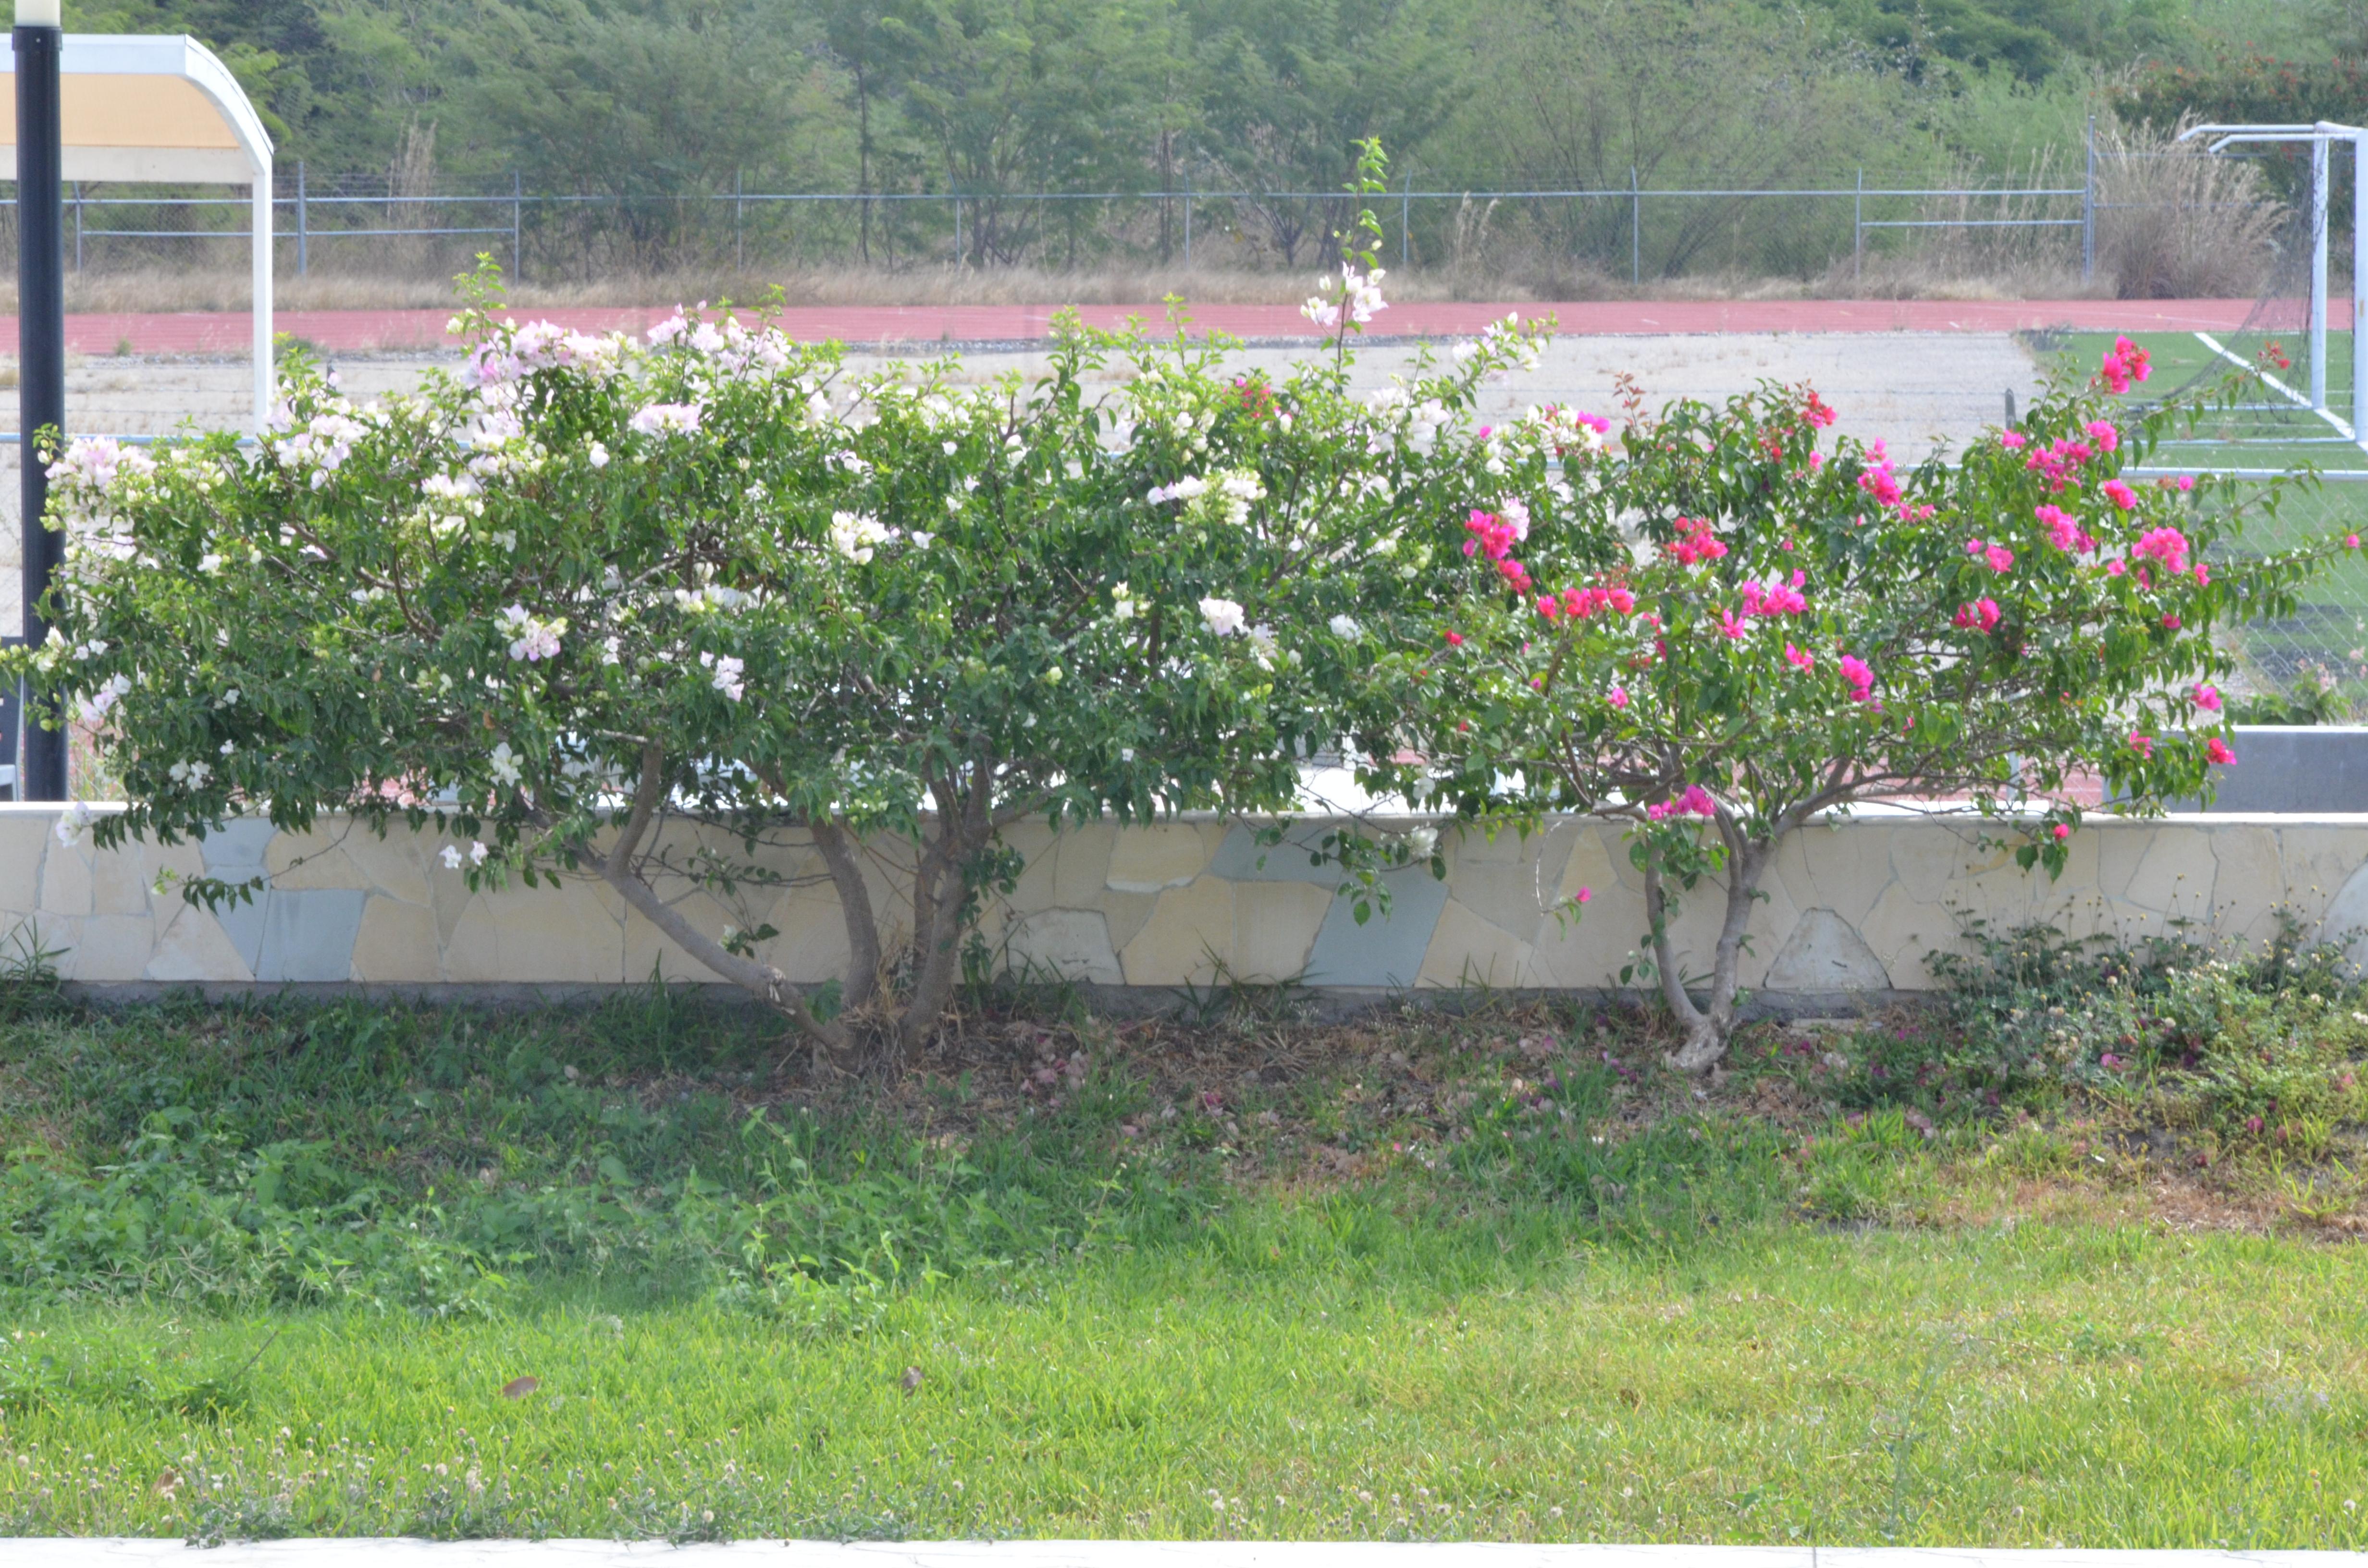 Free Images Flowers Tree White Rose Grass Flower Shrub Land